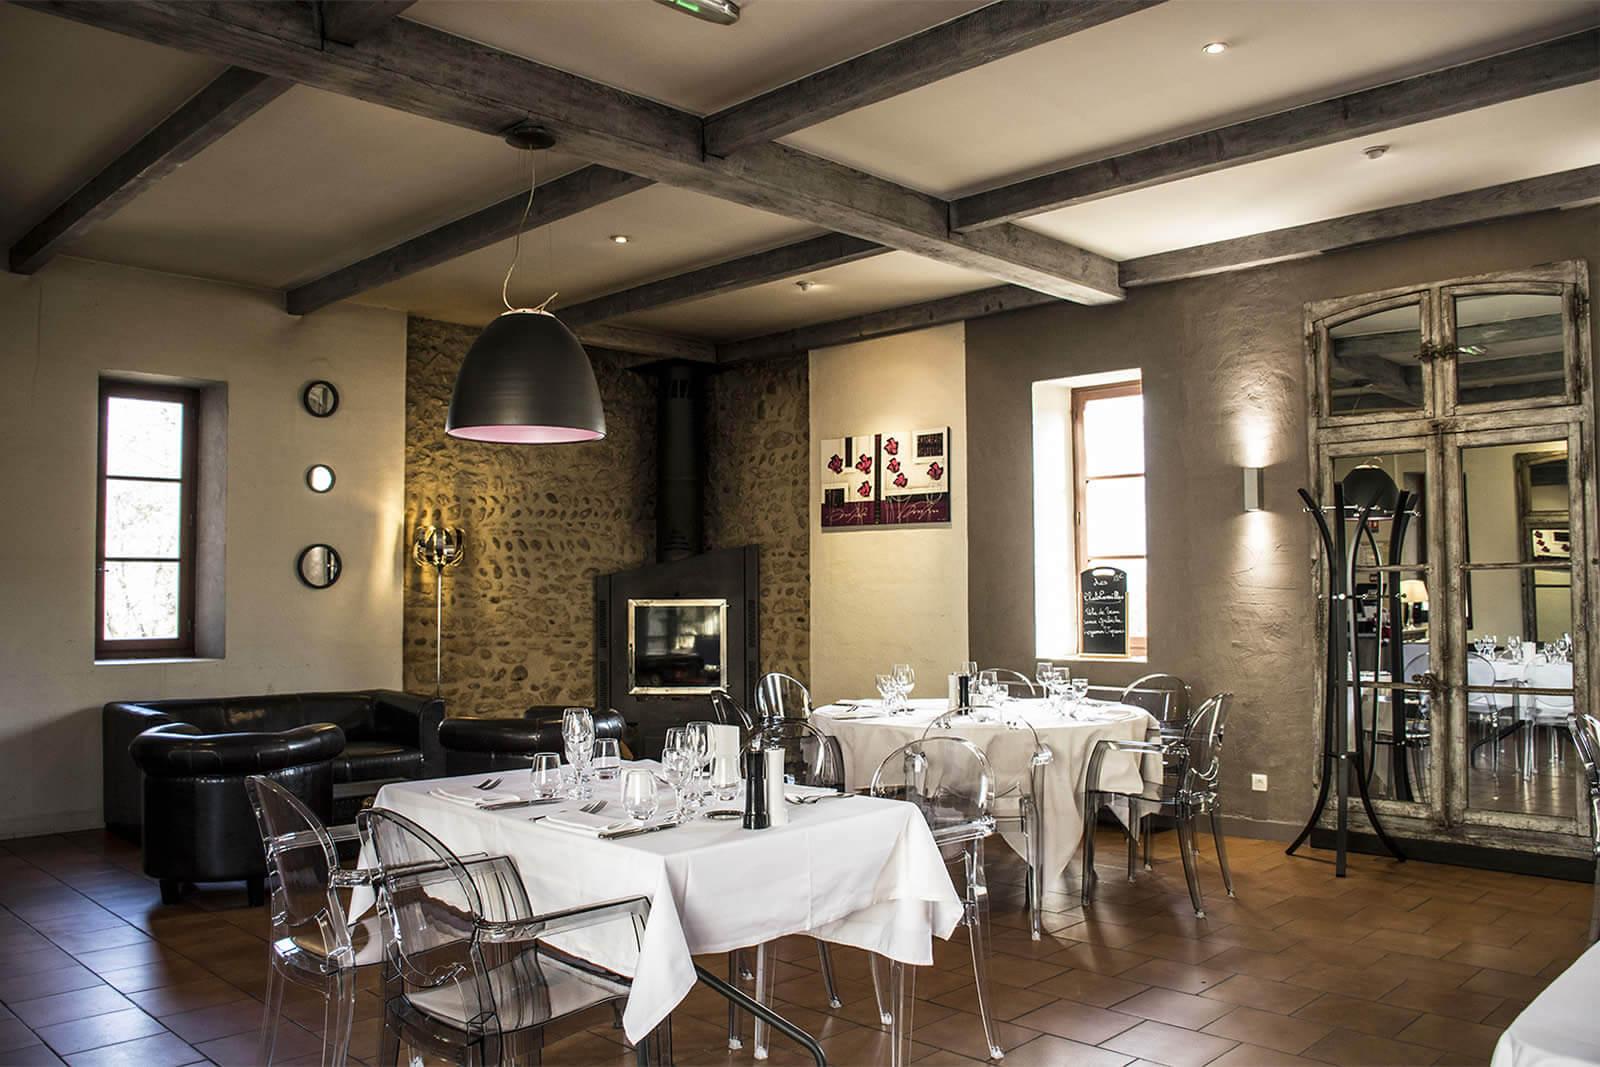 Restaurant Valence Ouvert Le Lundi Midi